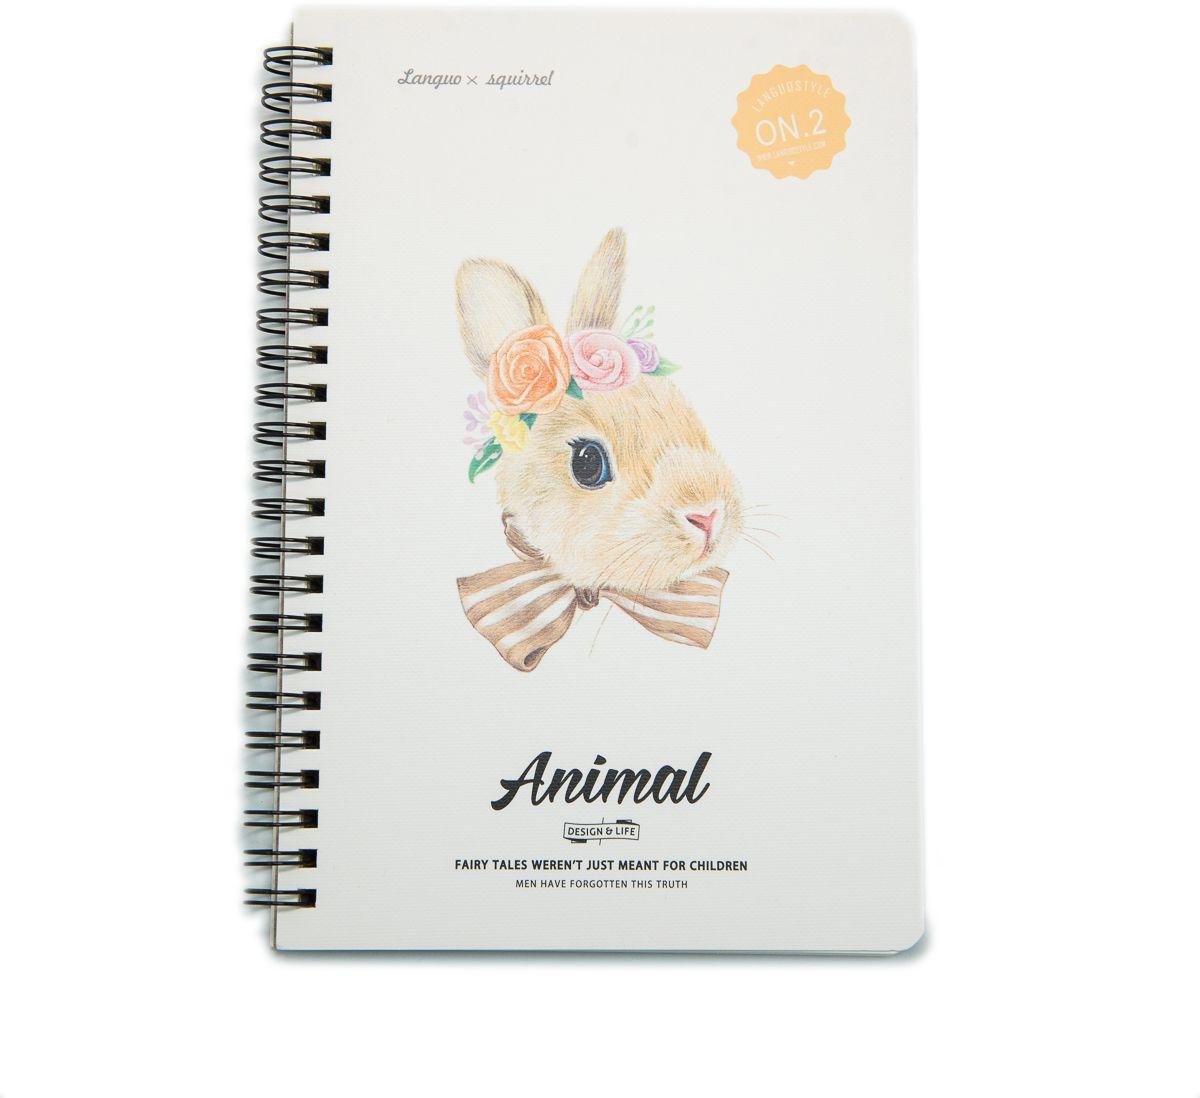 Еж-стайл Тетрадь Animal Rabbit 2 A5 68 листов в линейку еж стайл тетрадь deep in the meadow гусь 38 листов в линейку